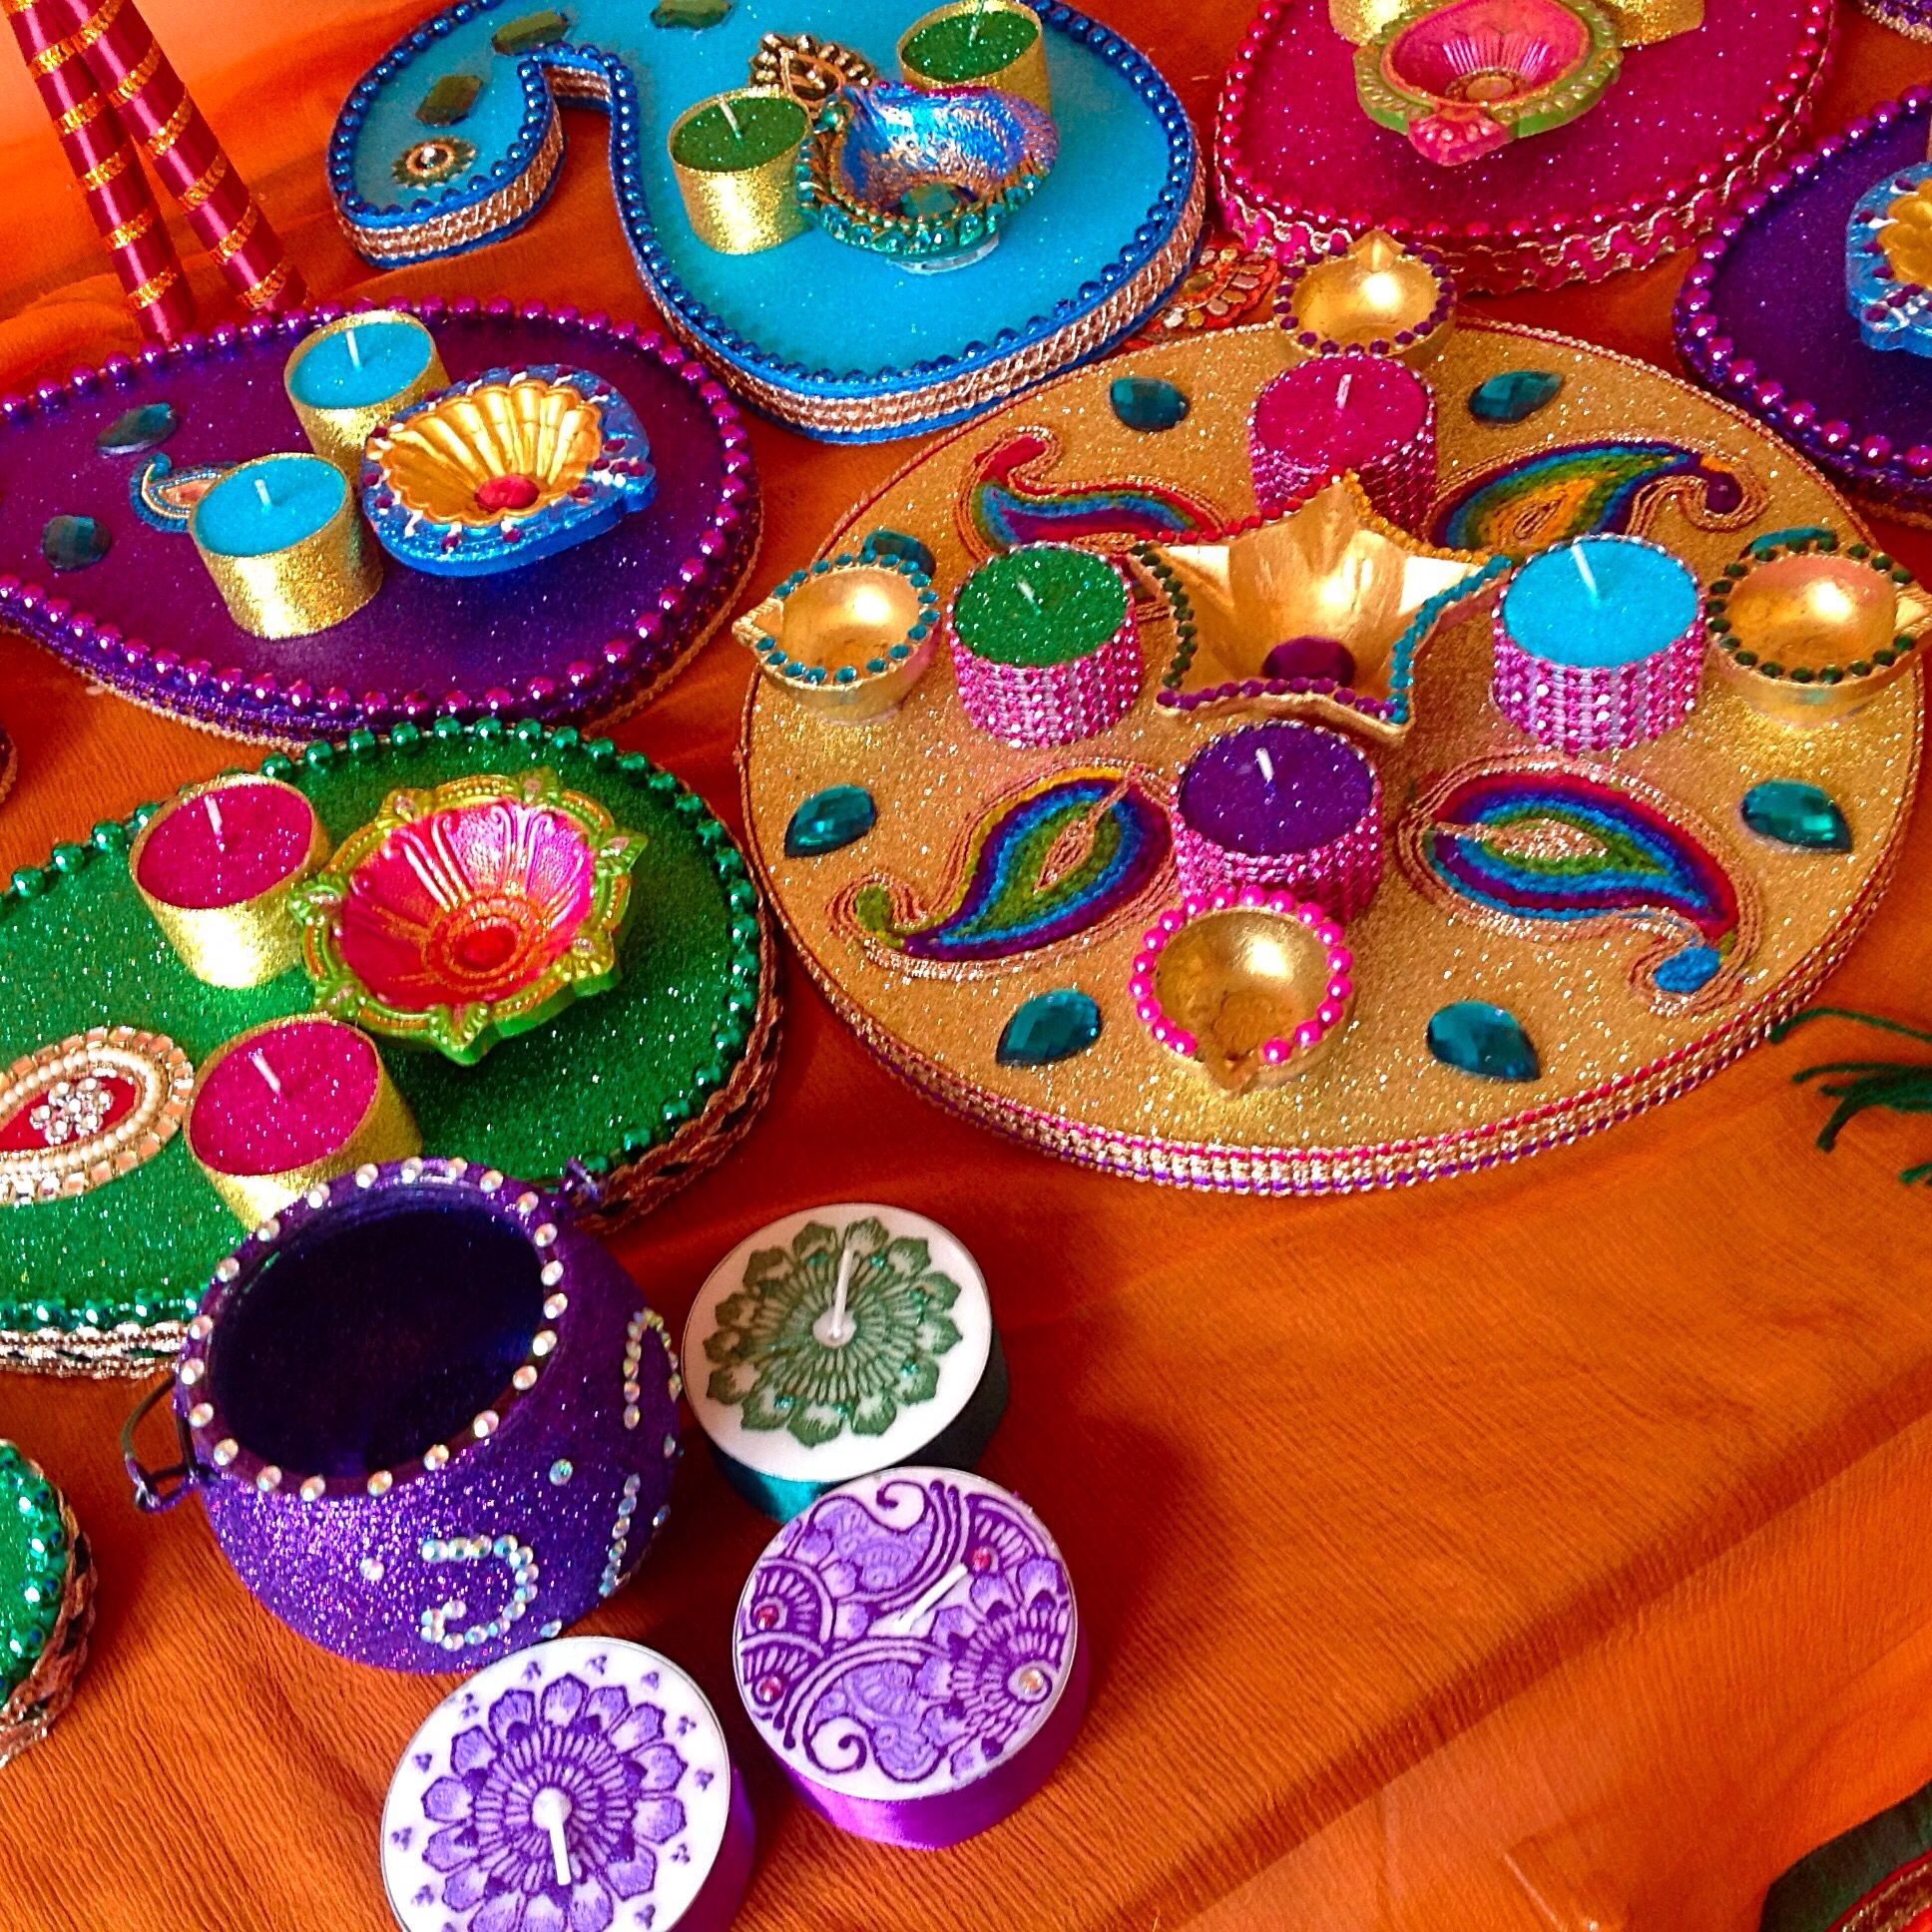 Mehndi plates by lesley rizvi at Mehndi trays for fun. See